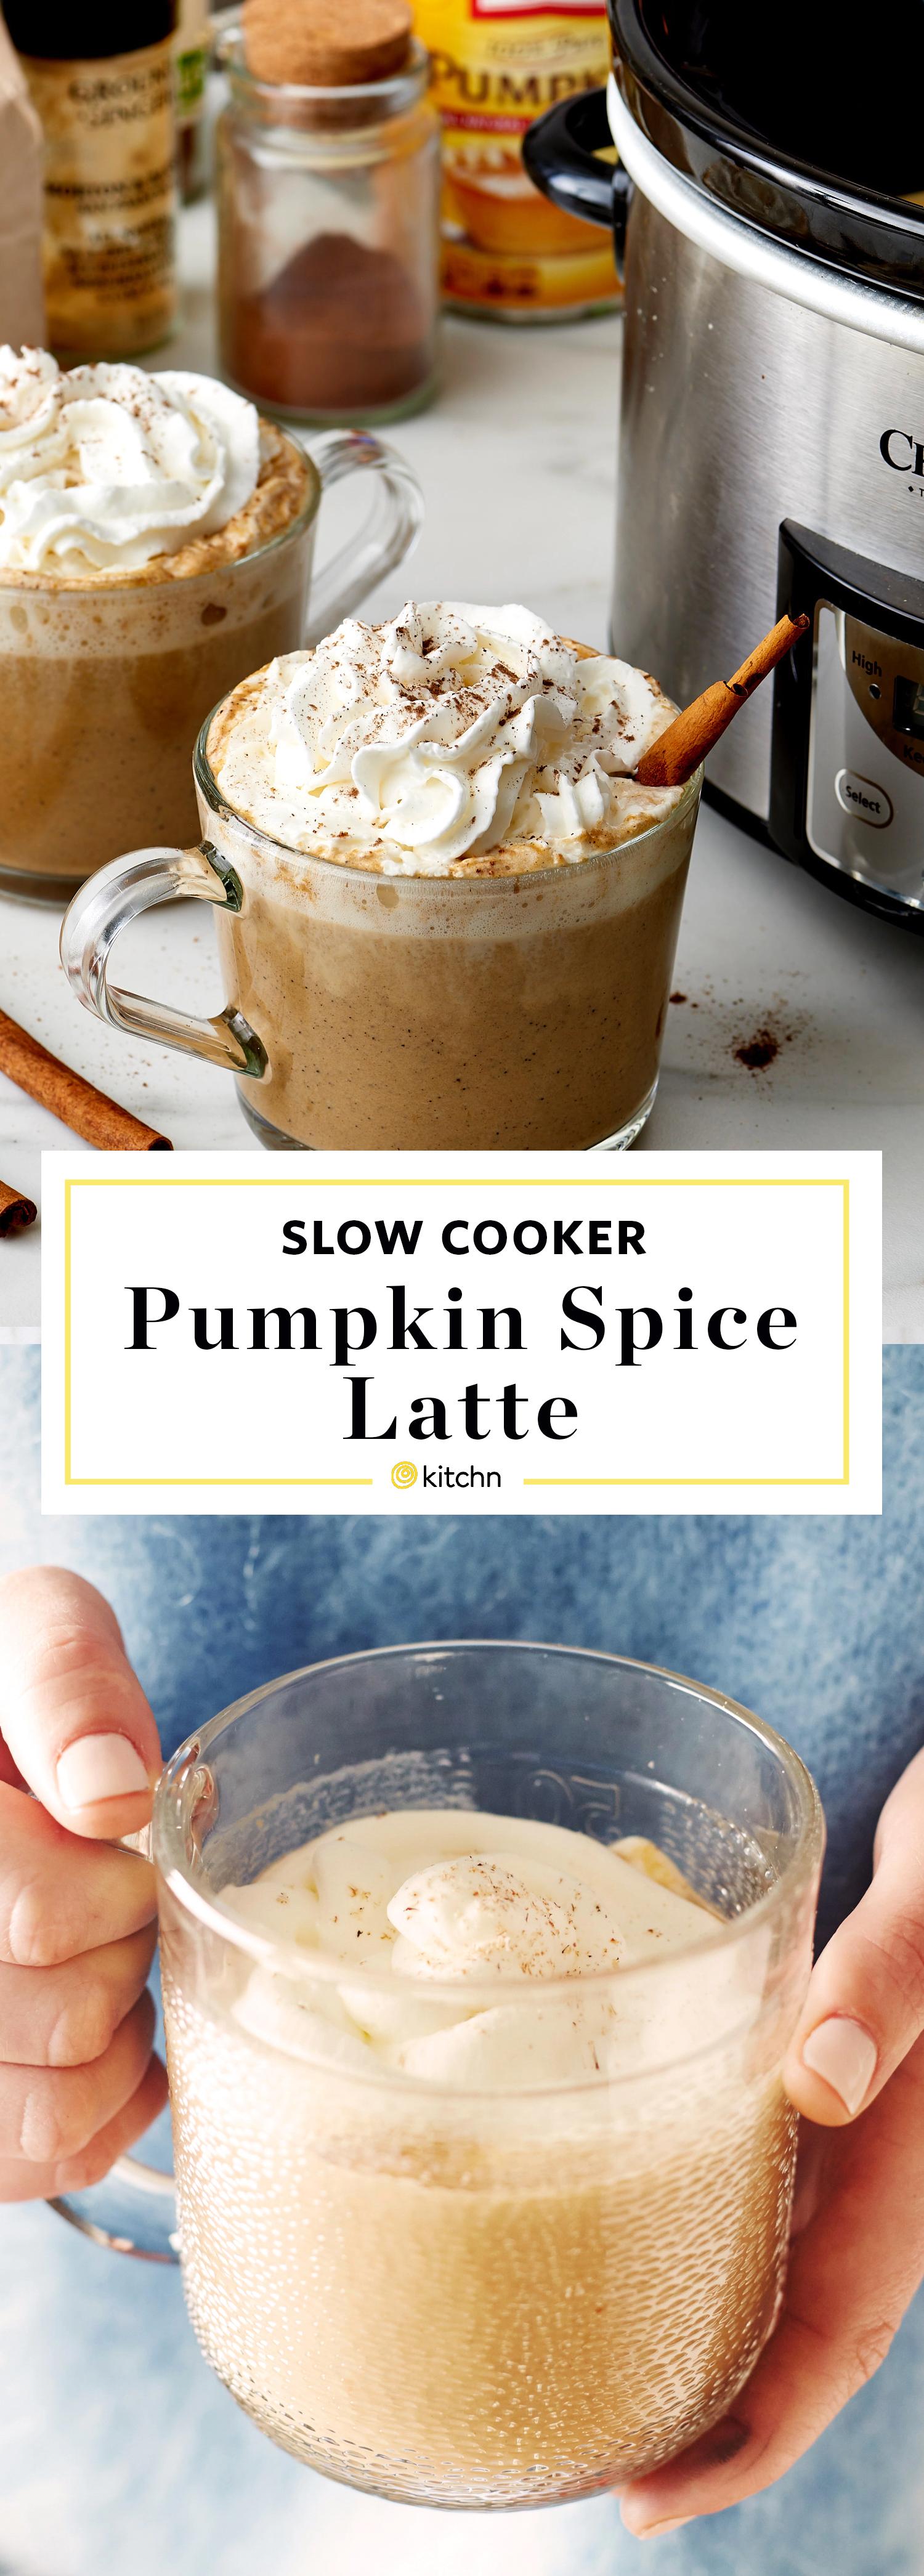 Slow-Cooker Pumpkin Spice Lattes